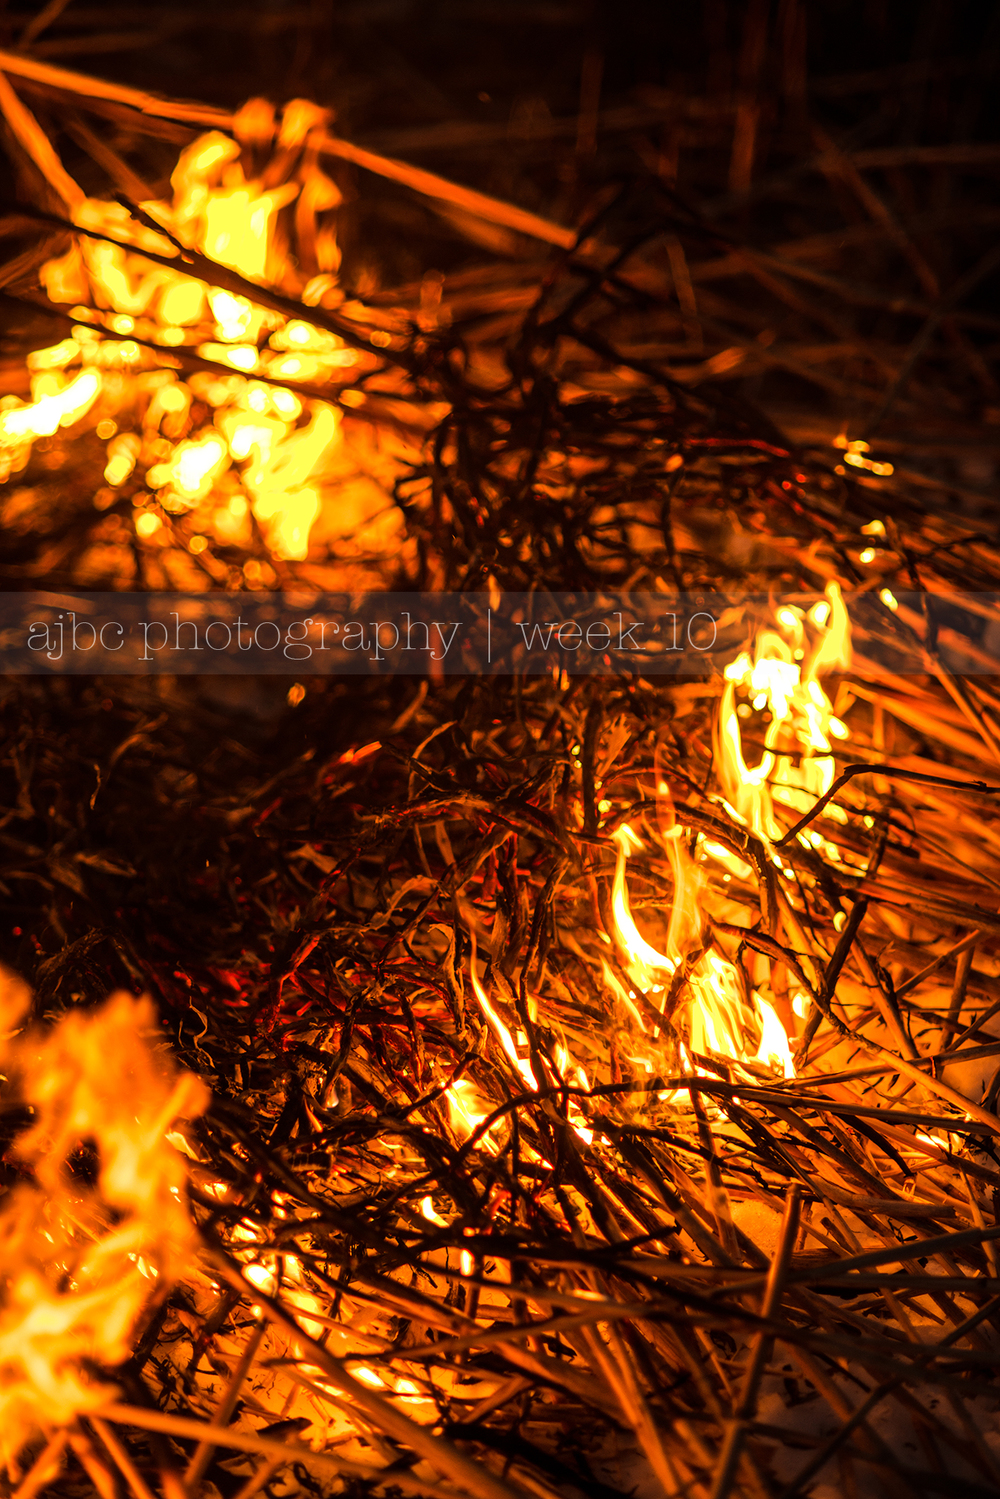 ajbc photography port huron photographer art burn fire arson